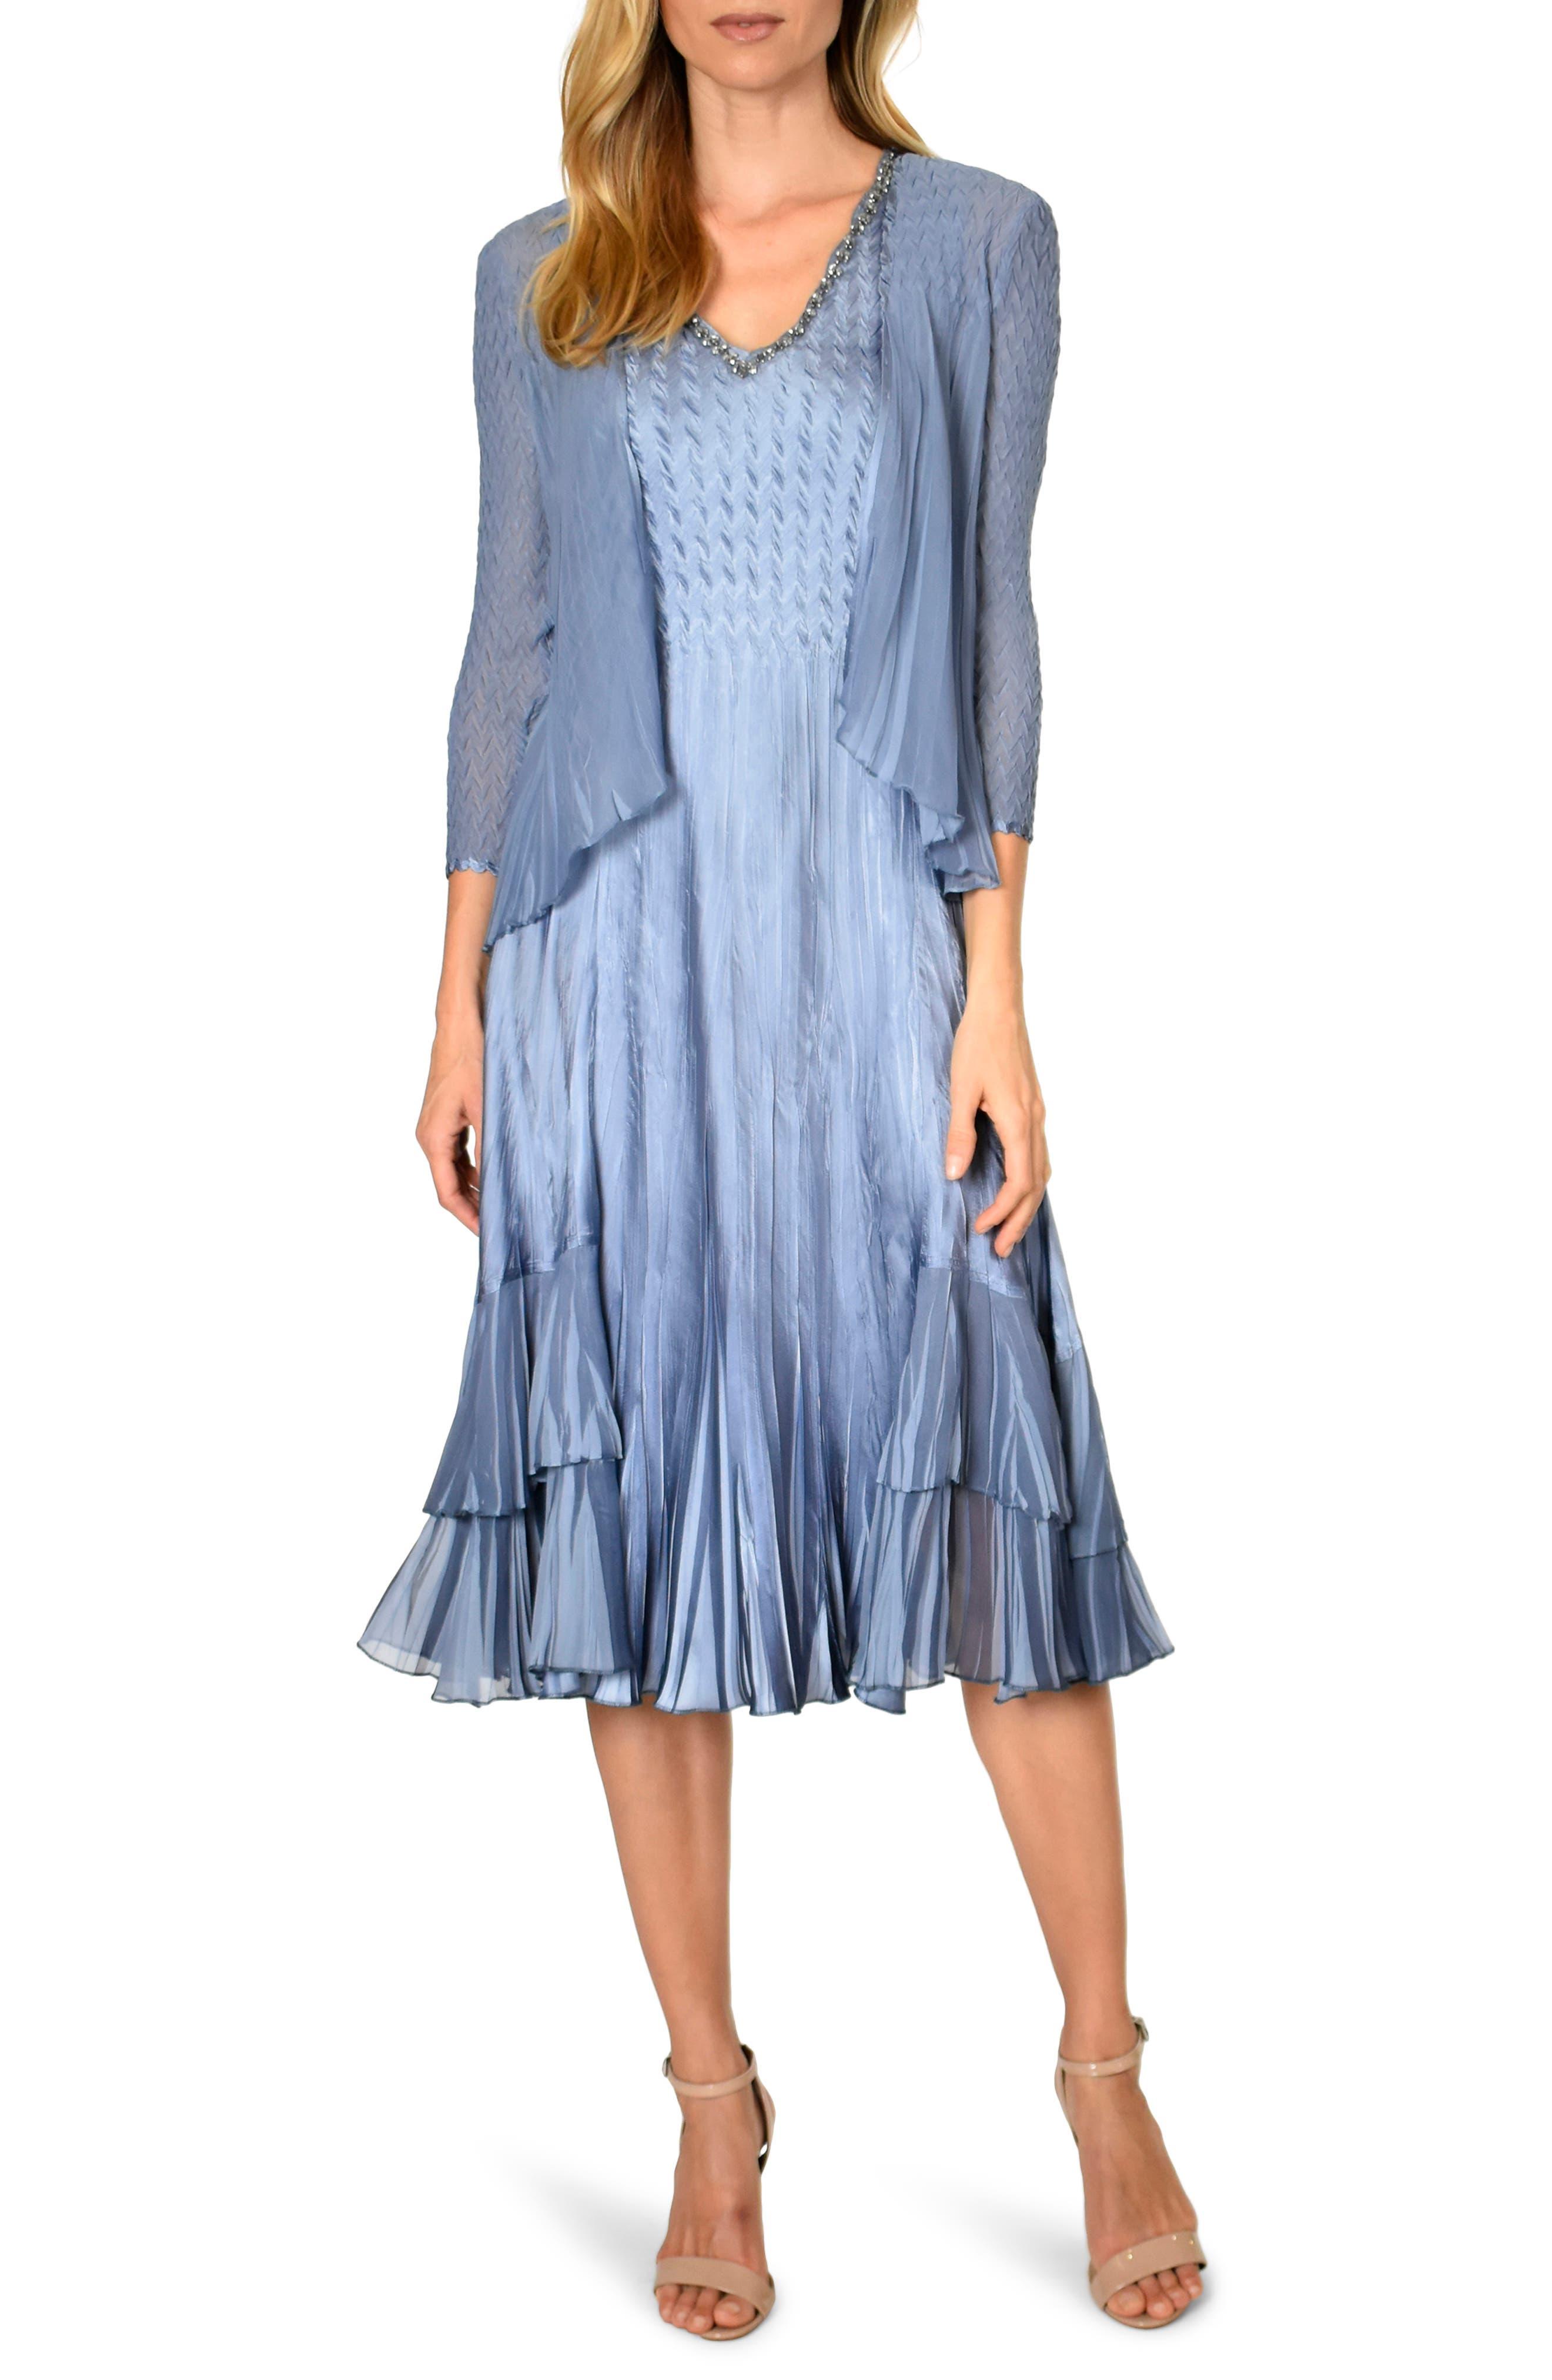 1920s Evening Dresses & Formal Gowns Womens Komarov Beaded Neck Tiered Hem Charmeuse Dress  Jacket $438.00 AT vintagedancer.com